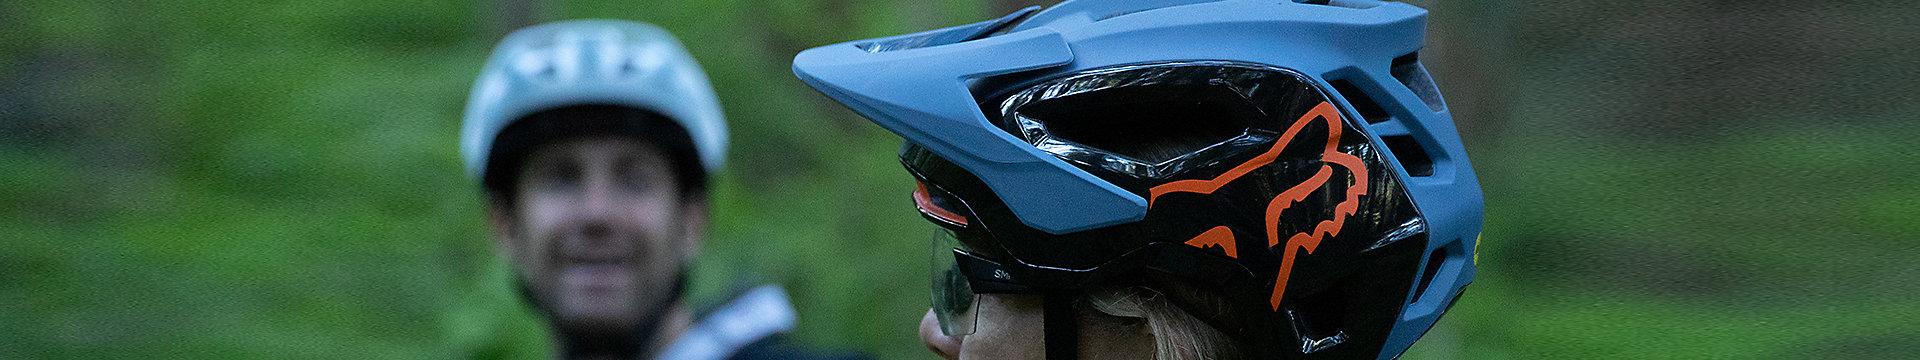 Fox MTB Helmets